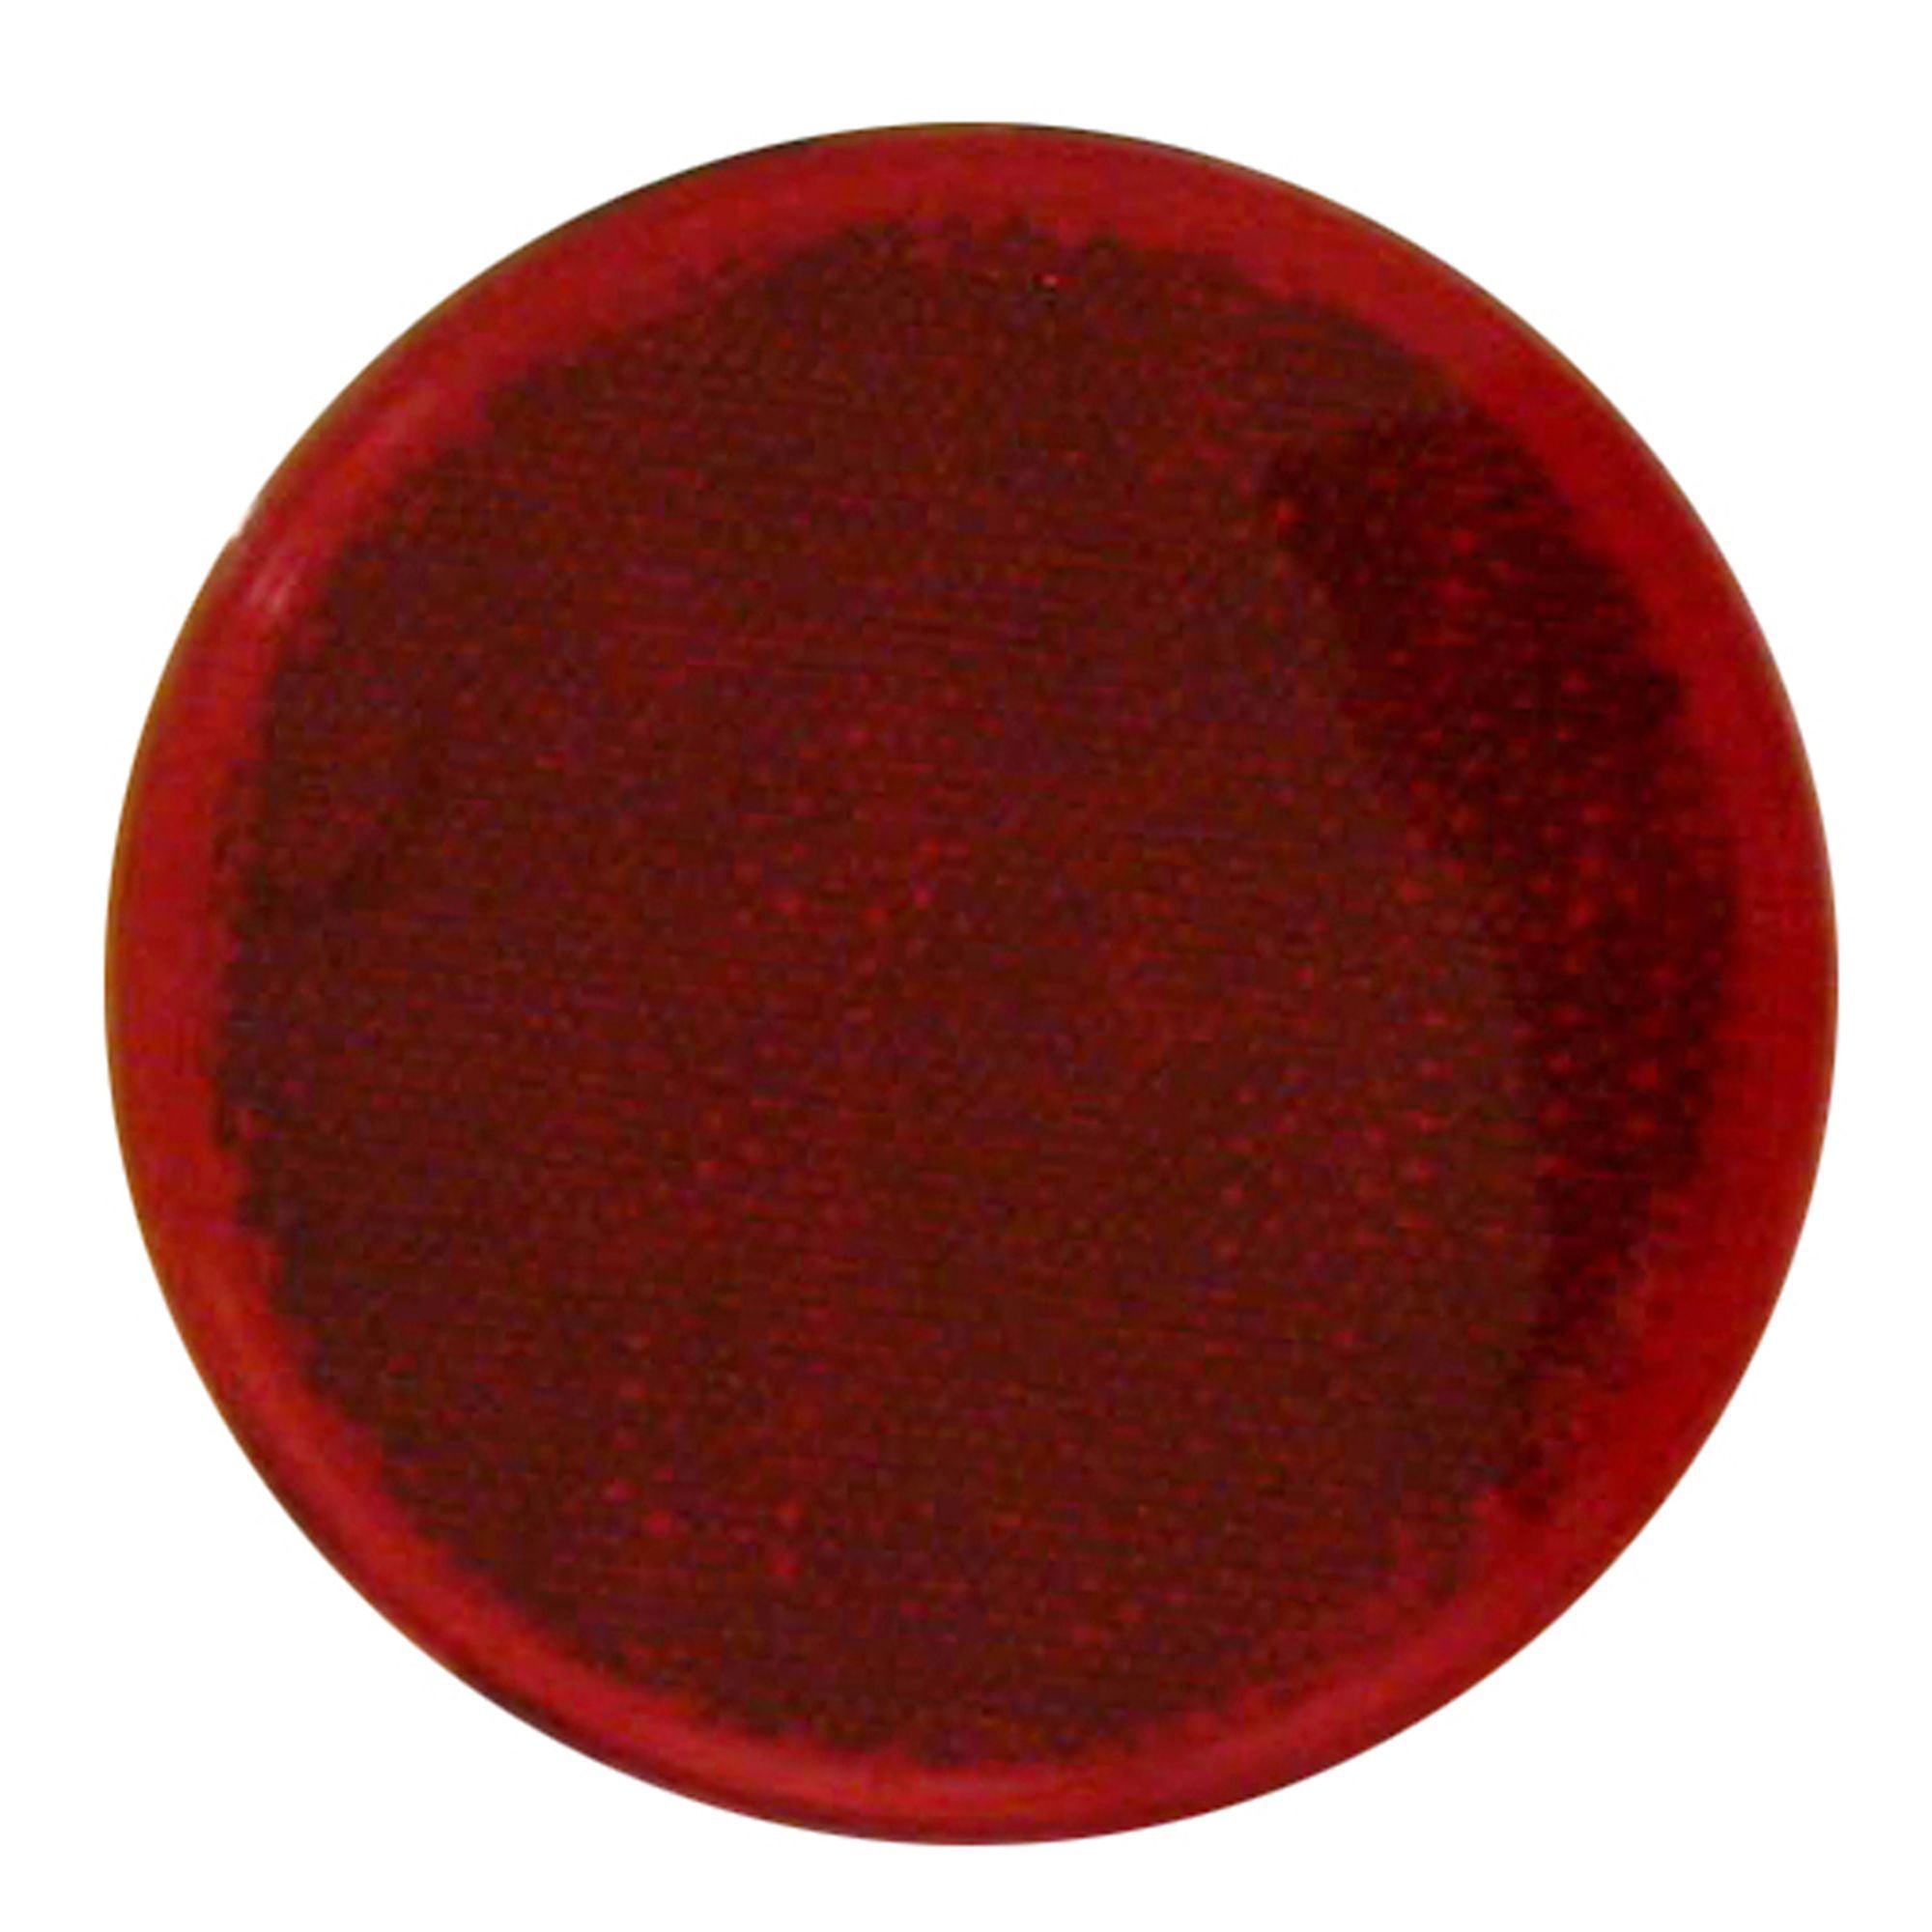 Pilot Automotive NV-5067R 3 inch Round Stick-on Side Marker / Reflector-Red Size: 3-5/32 x 7/32